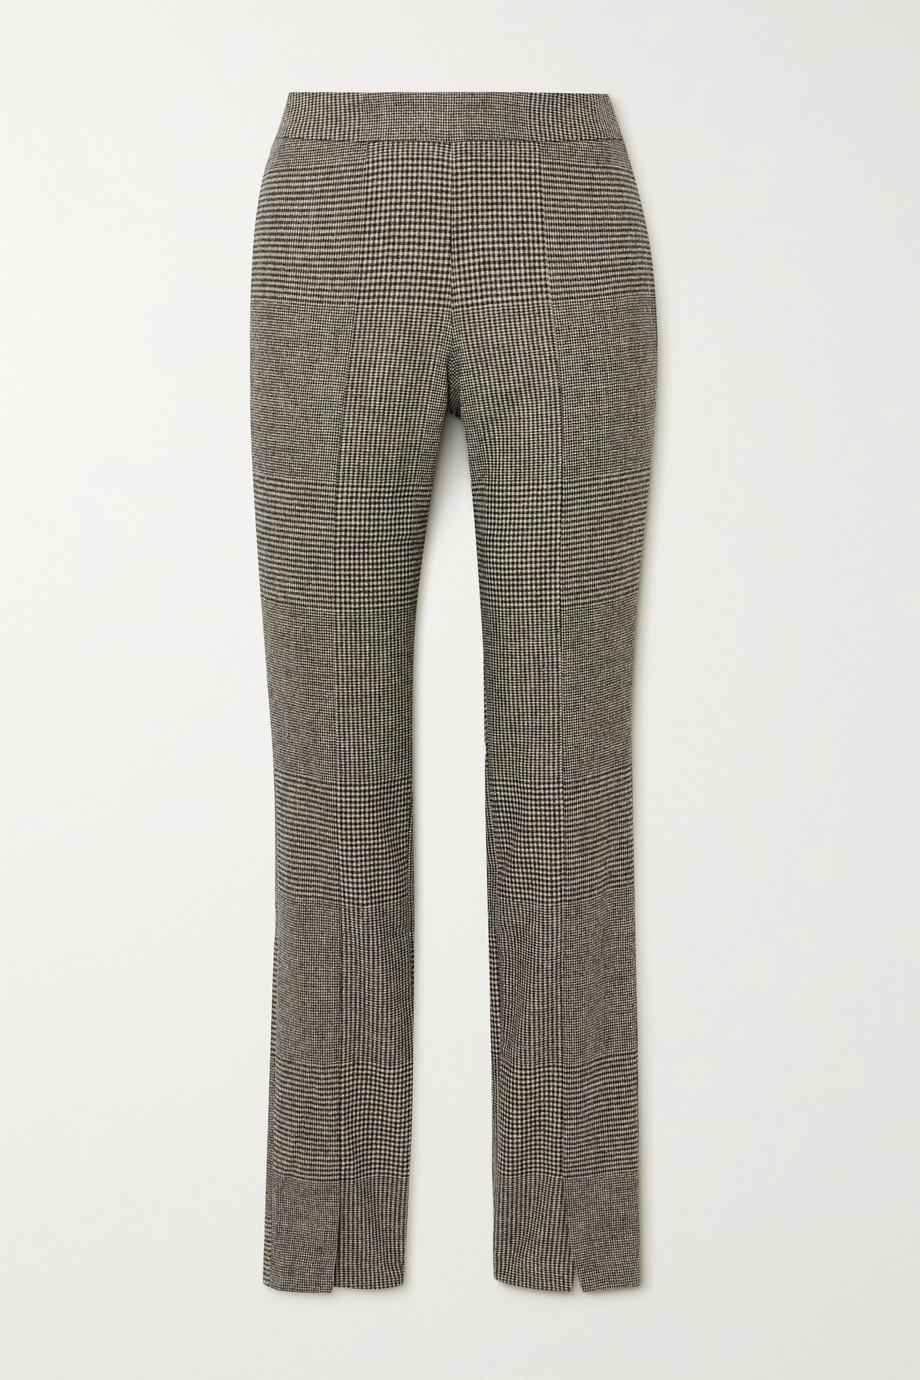 Holzweiler Pantalon slim tissé à carreaux Sira